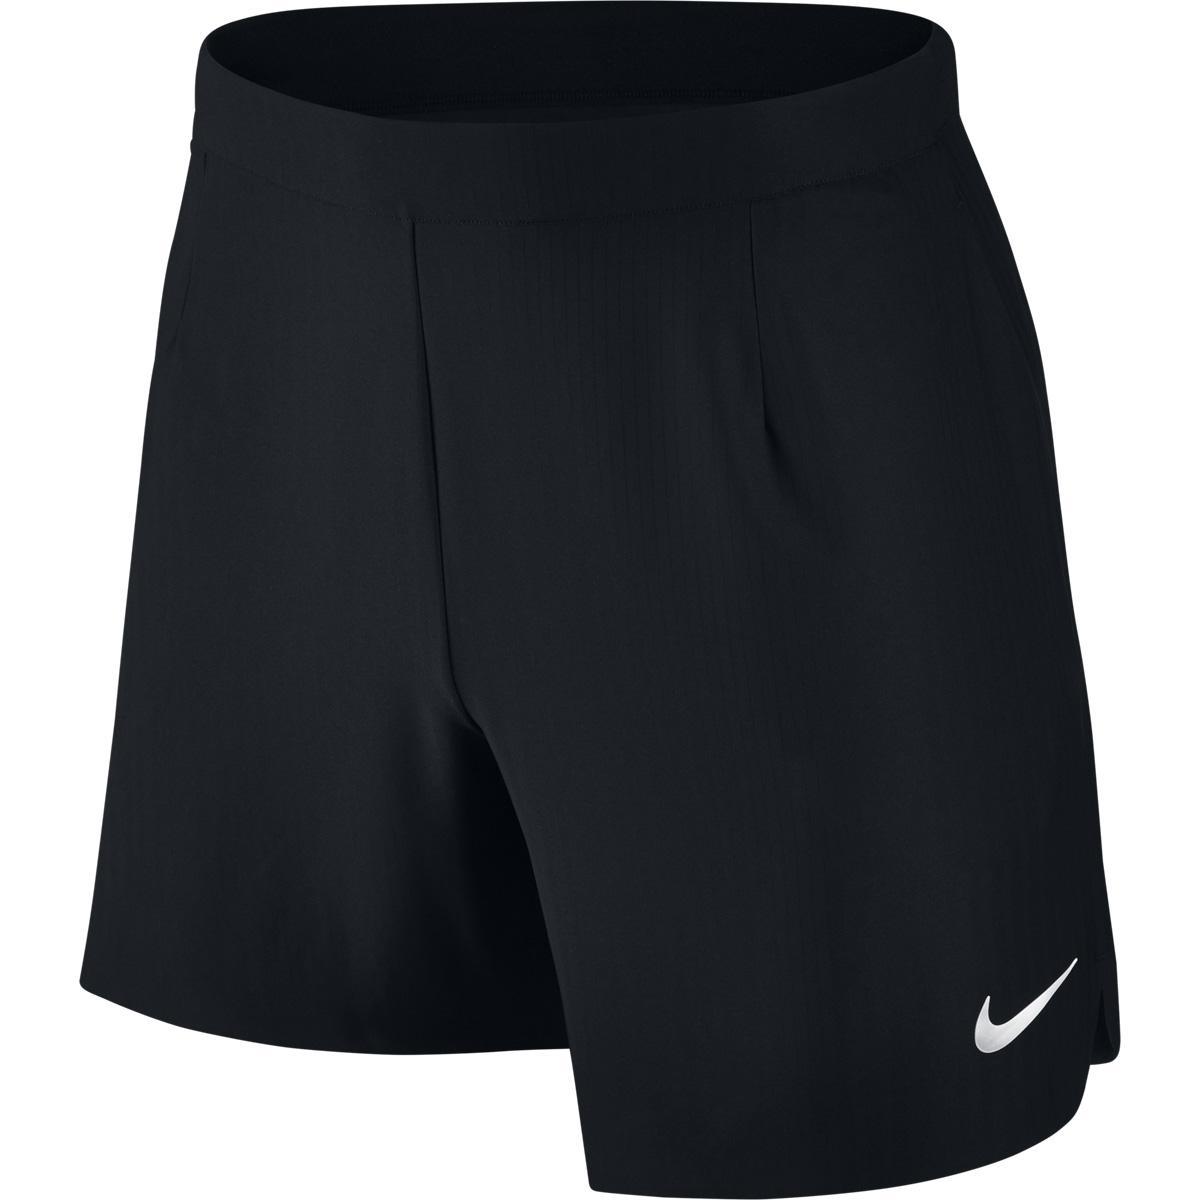 nike boys flex ace 6 inch tennis shorts black. Black Bedroom Furniture Sets. Home Design Ideas